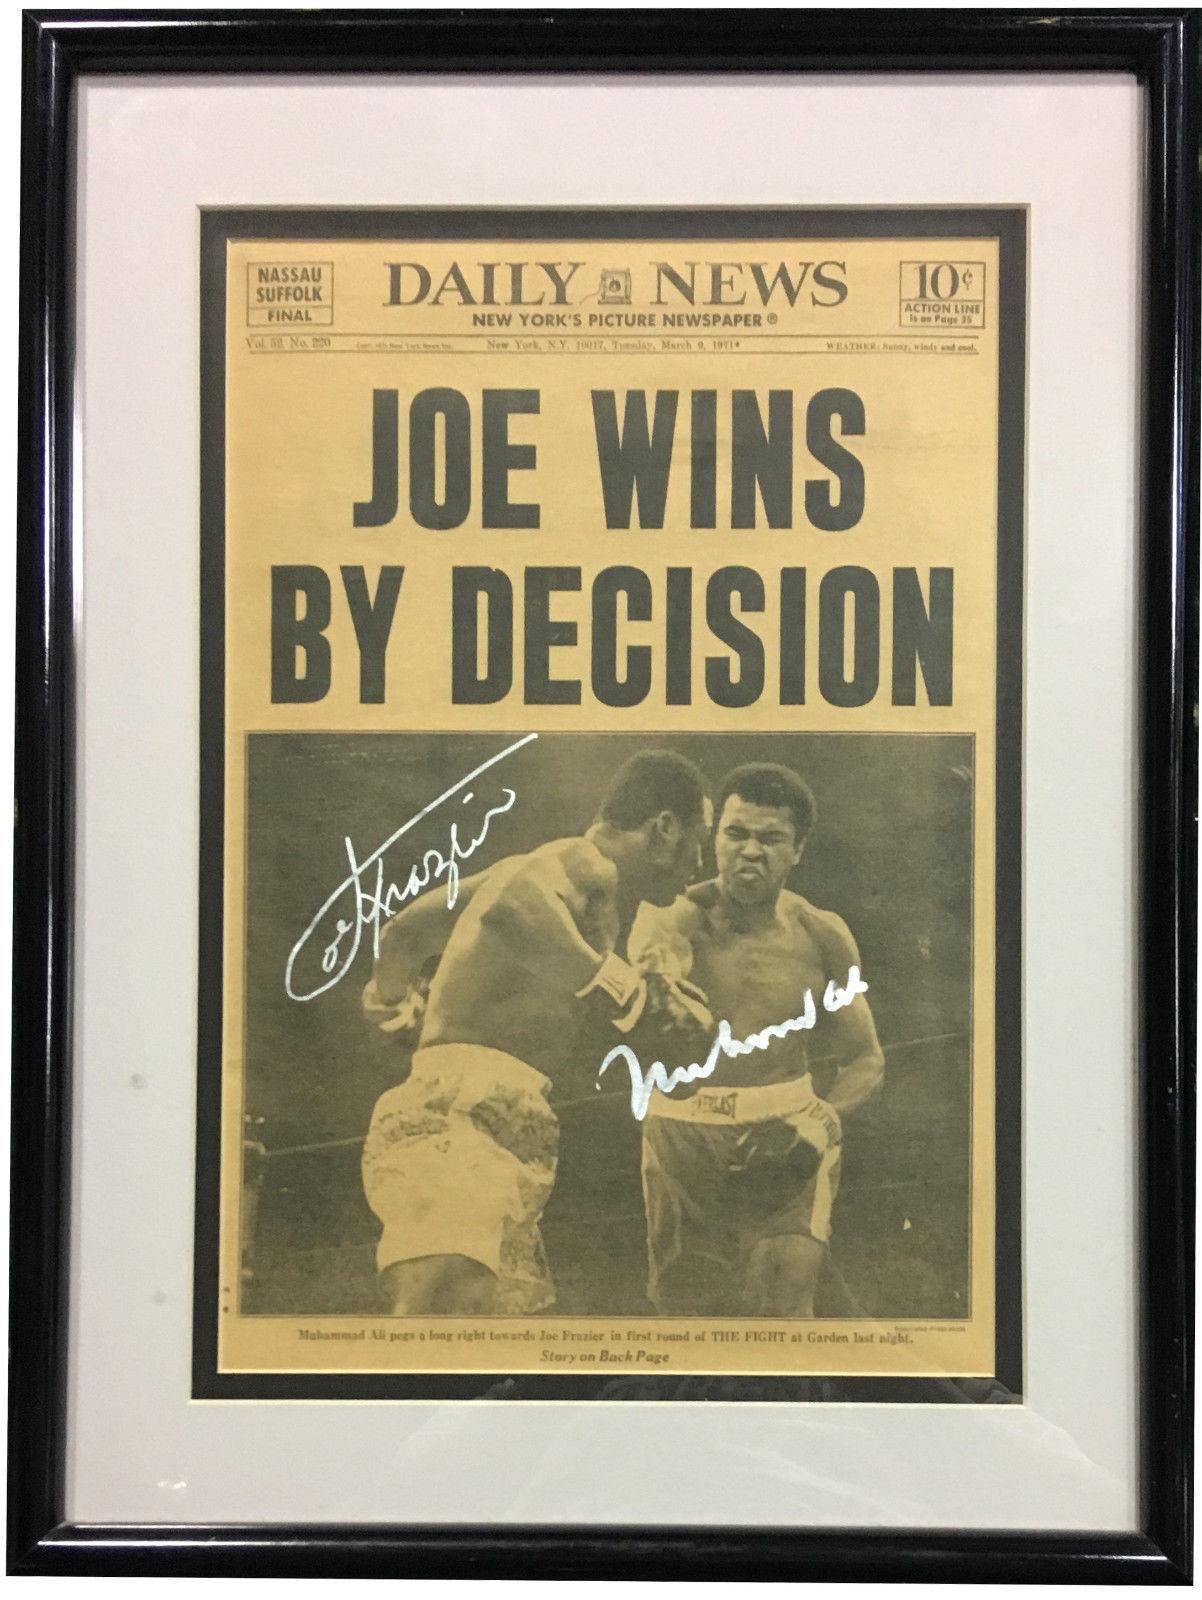 Muhammad Ali Joe Frazier signed 1971 Daily News Newspaper framed 2 auto CBM COA